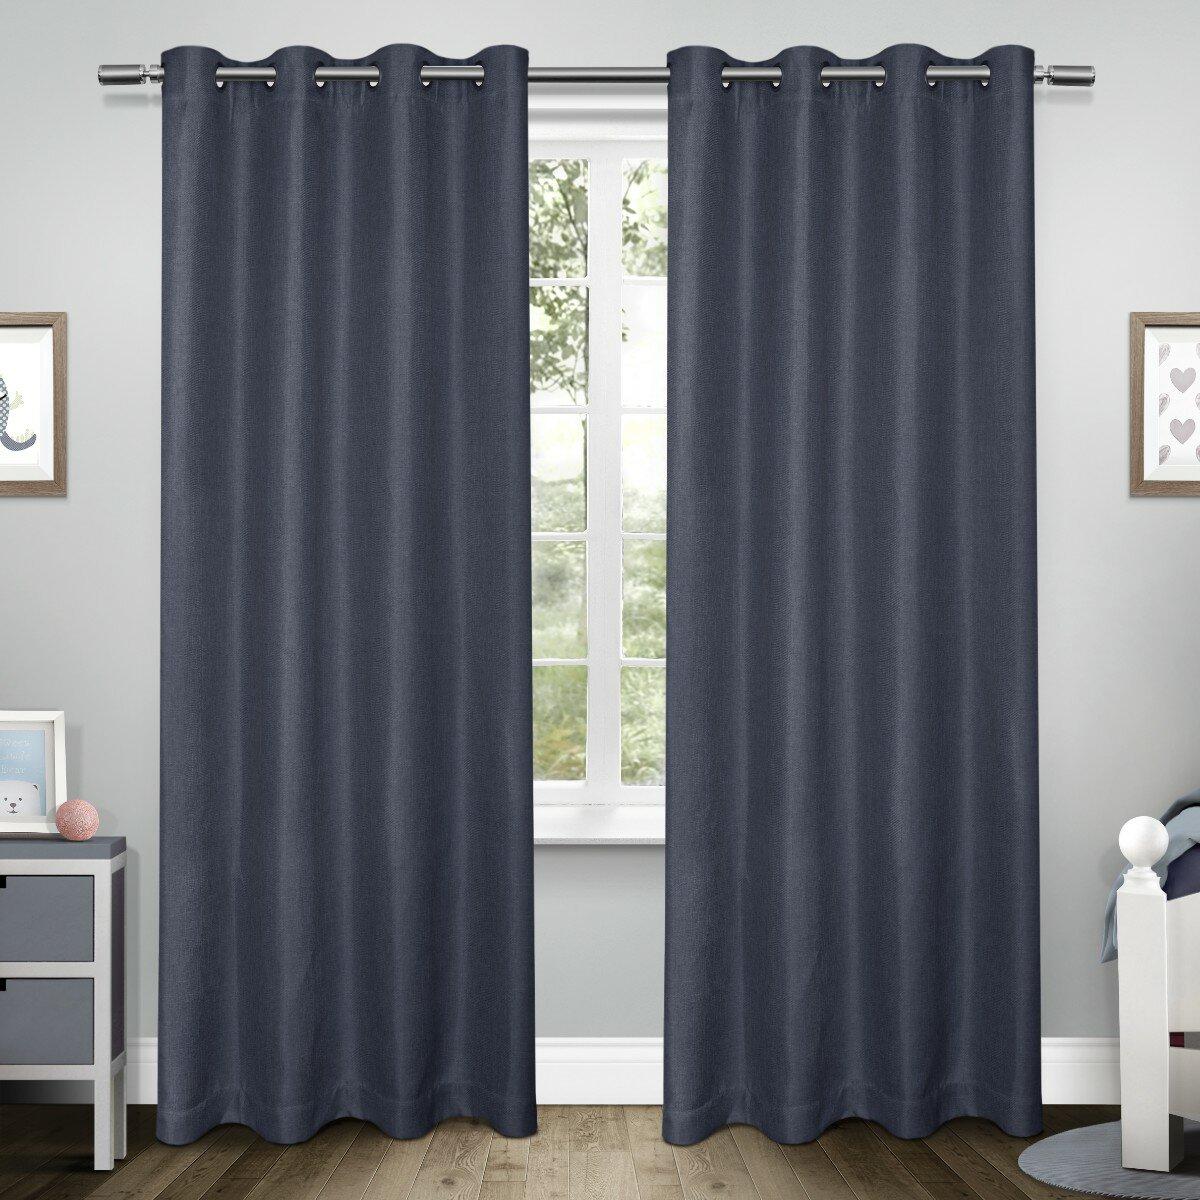 Amalgamated Textiles Exclusive Home Tweed Kids Textured Linen Woven Blackout Grommet Top